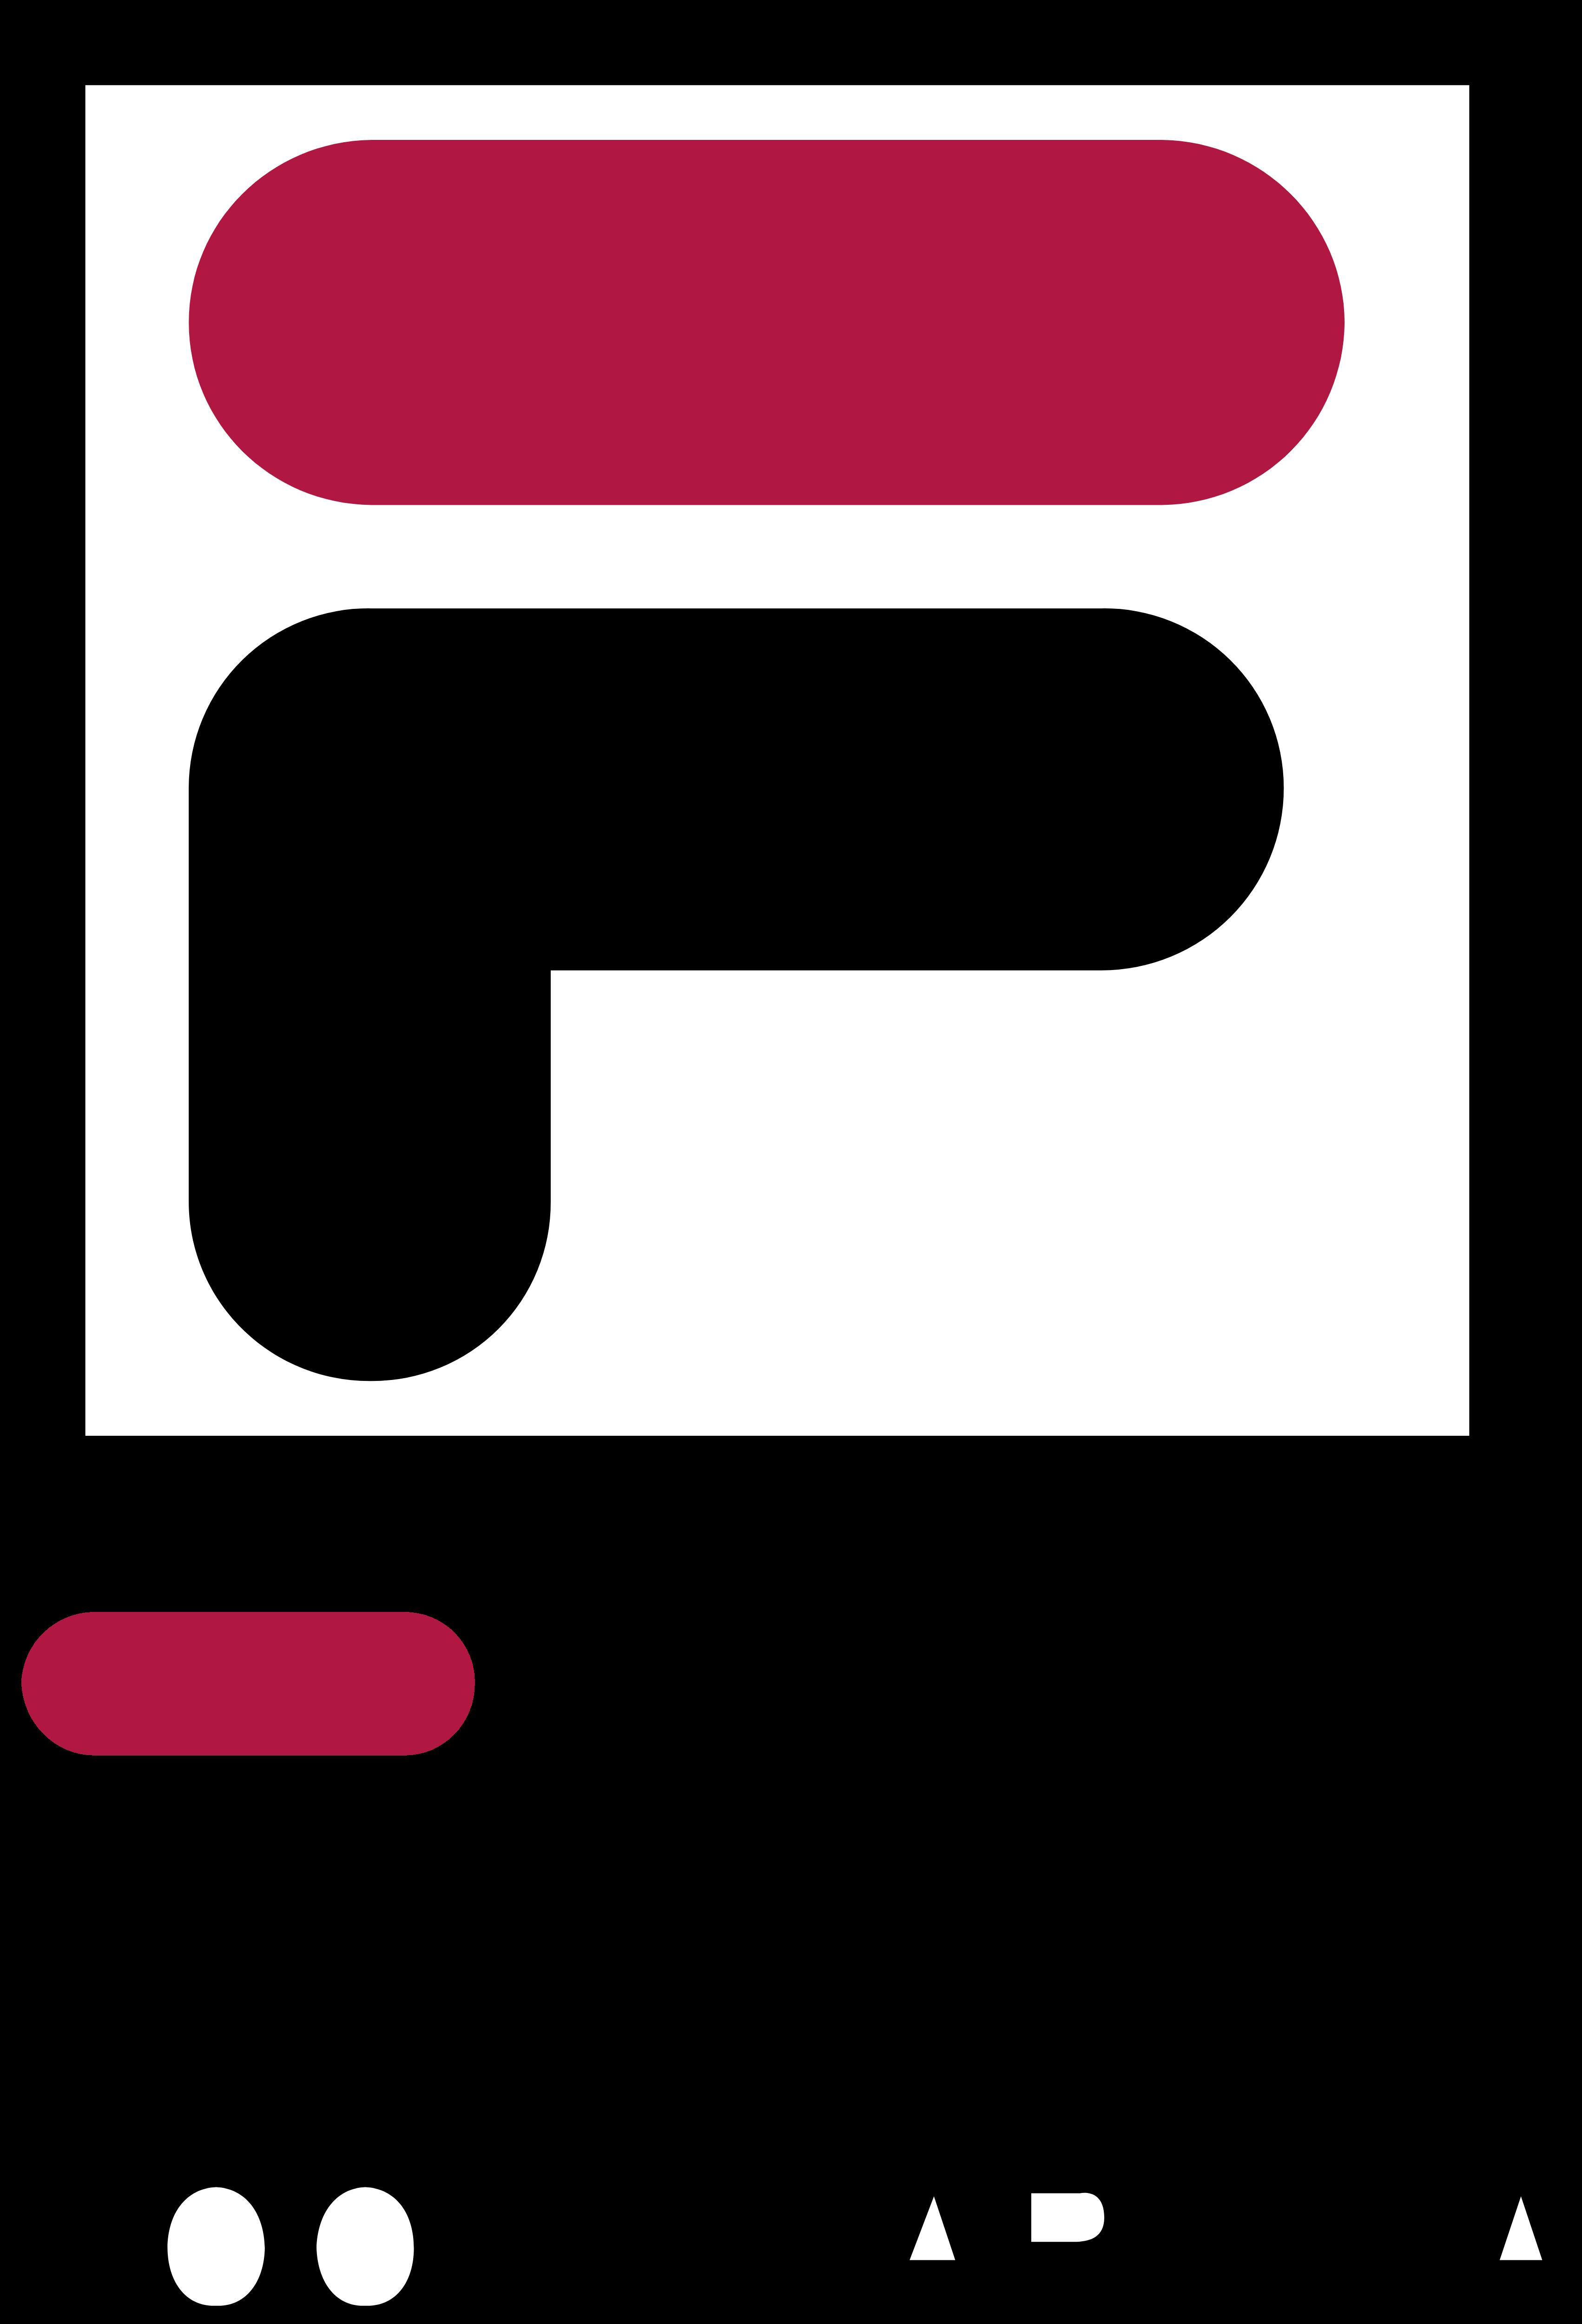 fila logos download Real Estate Sign Clip Art Real Estate Sellers Clip Art